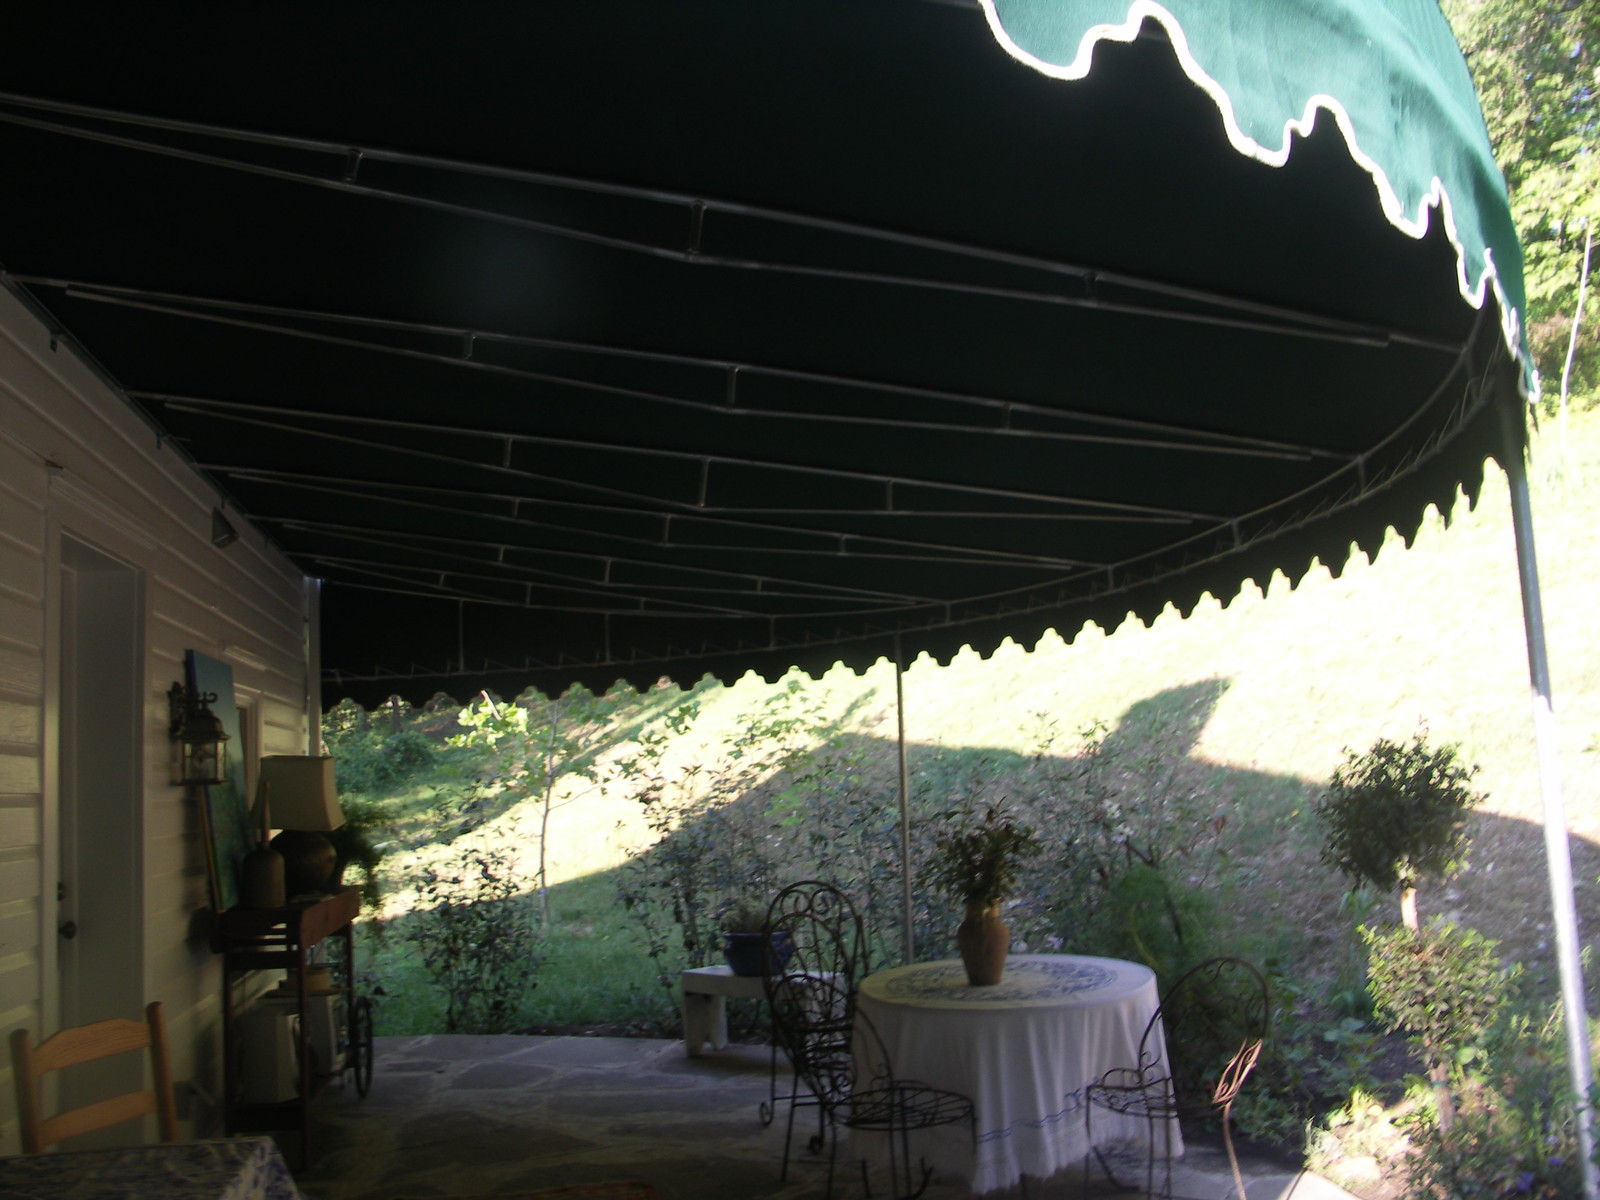 contoured-patio-awning-baltimore_14715187057_o